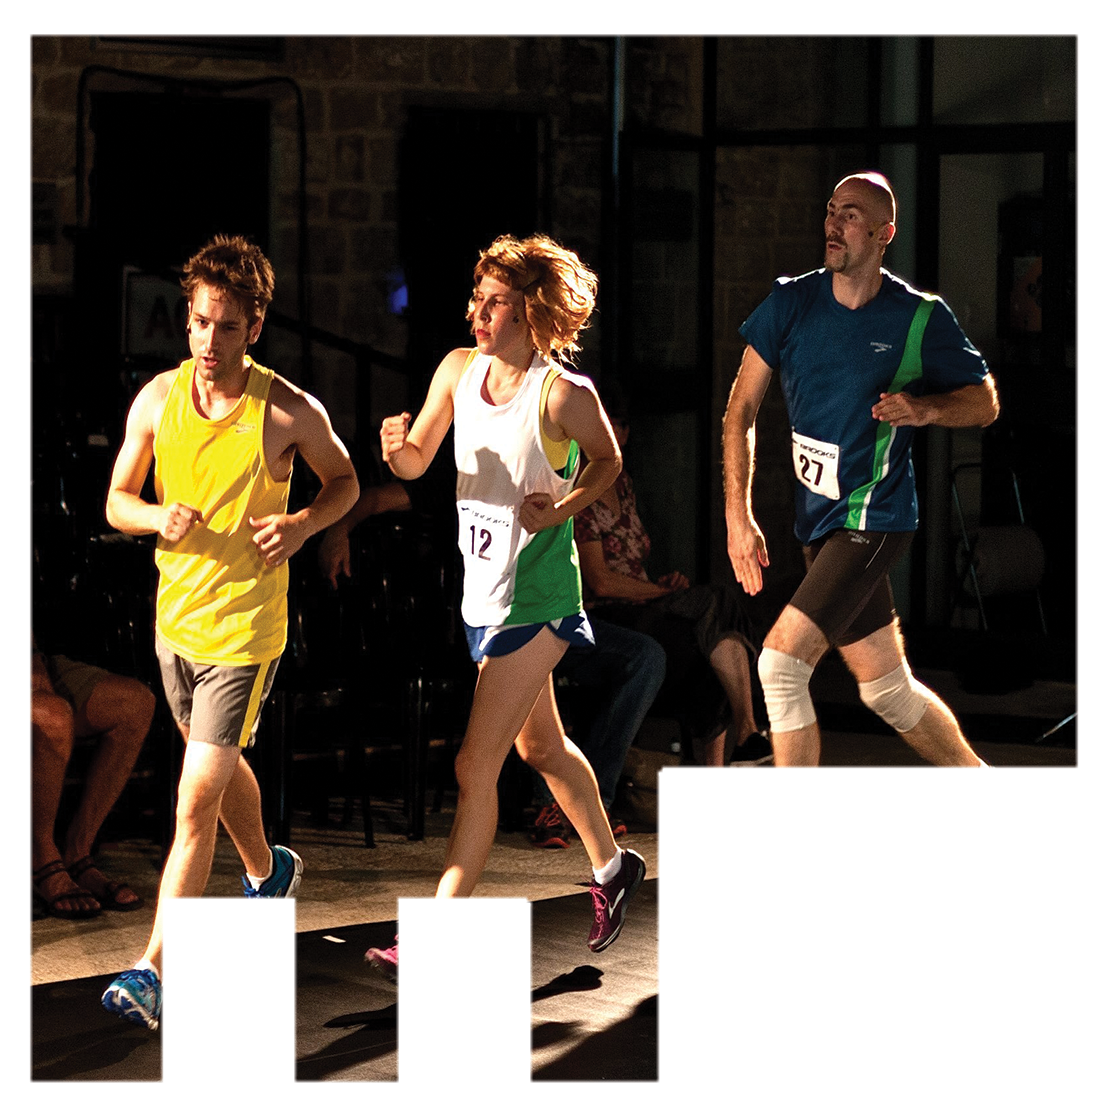 Marathon  in the photo.